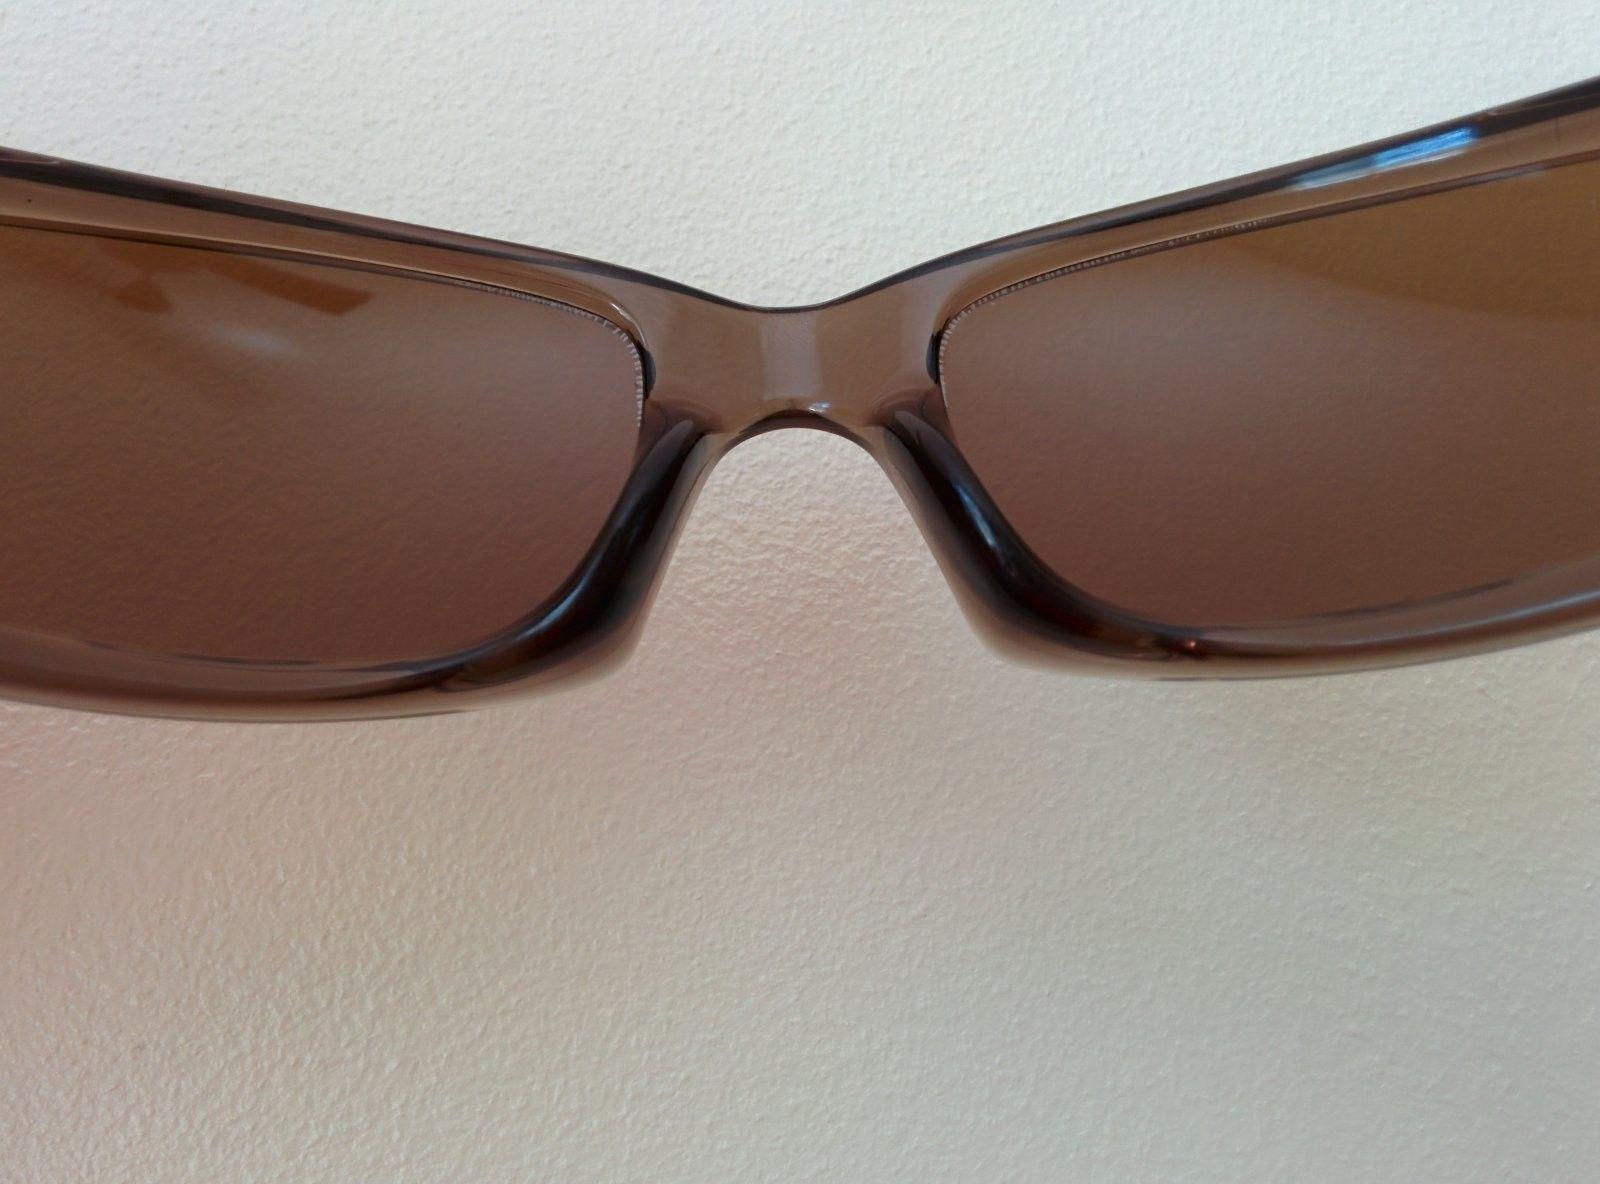 Fives Squared-Brown Smoke/Bronze Lens - IMG_20140613_162007.jpg